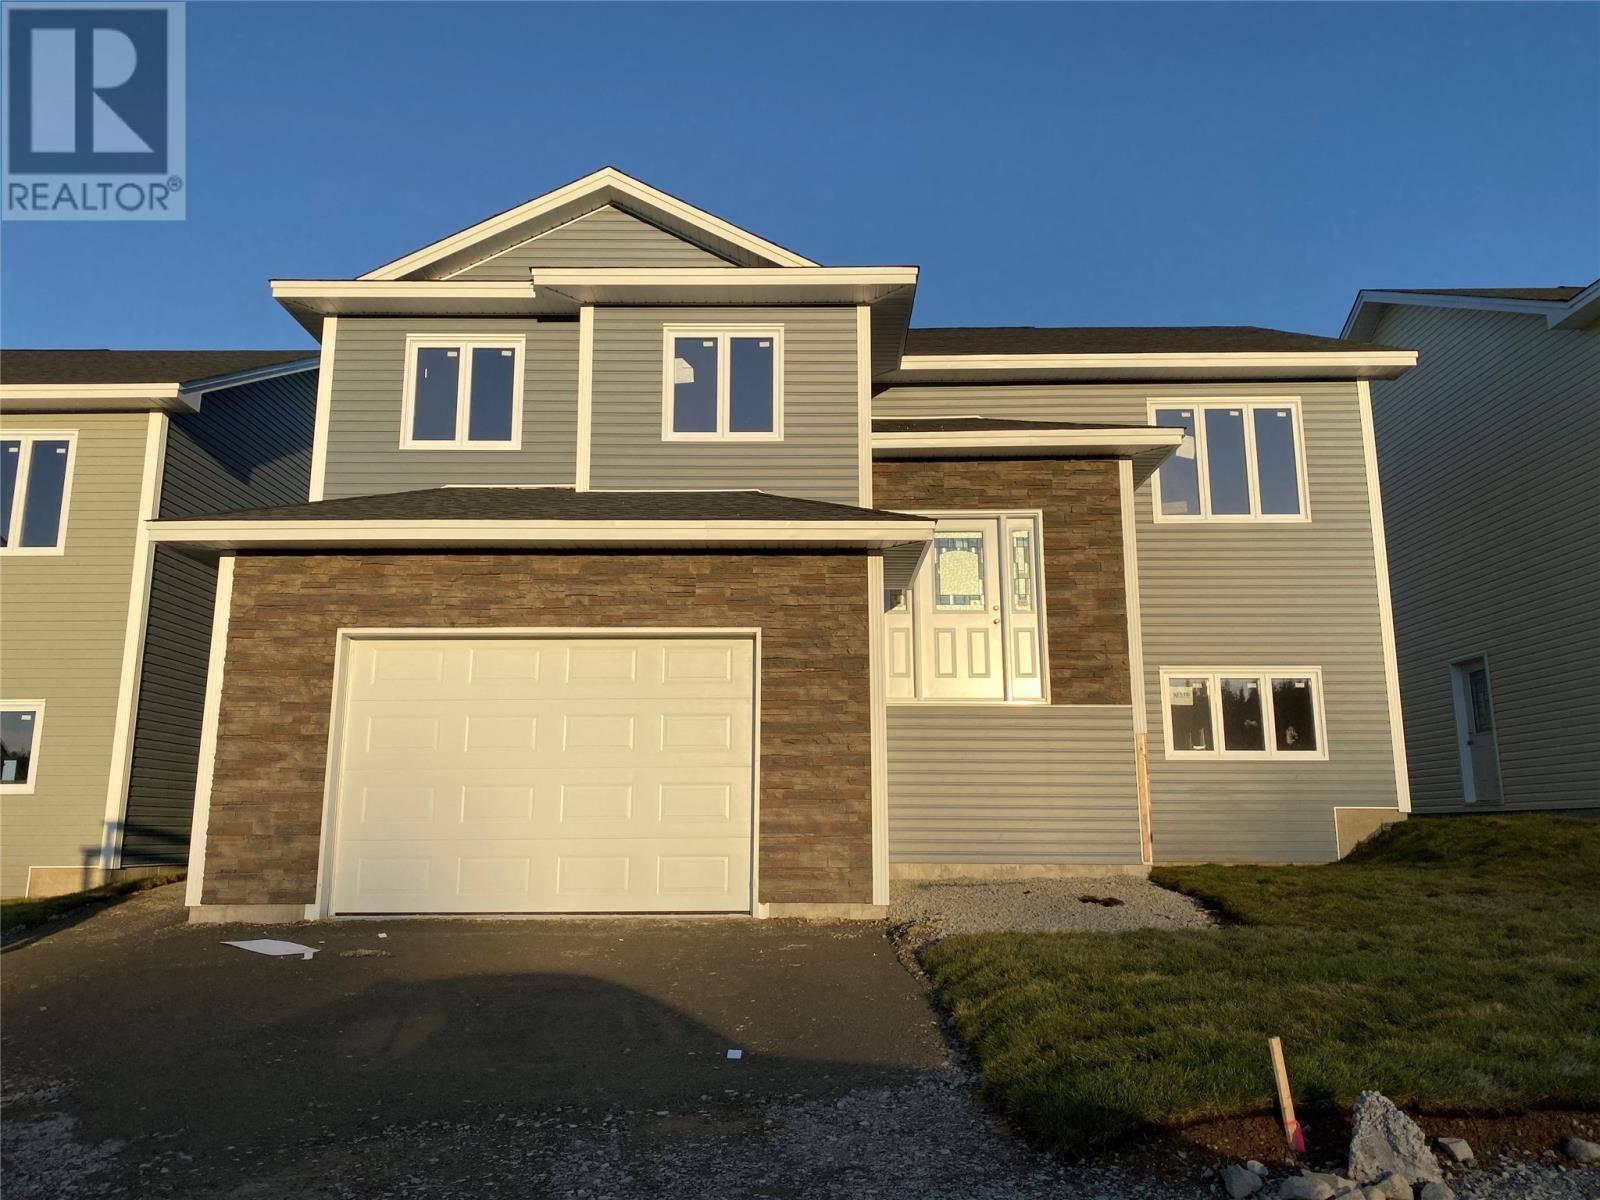 House for sale at 90 Tigress St St. John's Newfoundland - MLS: 1209381